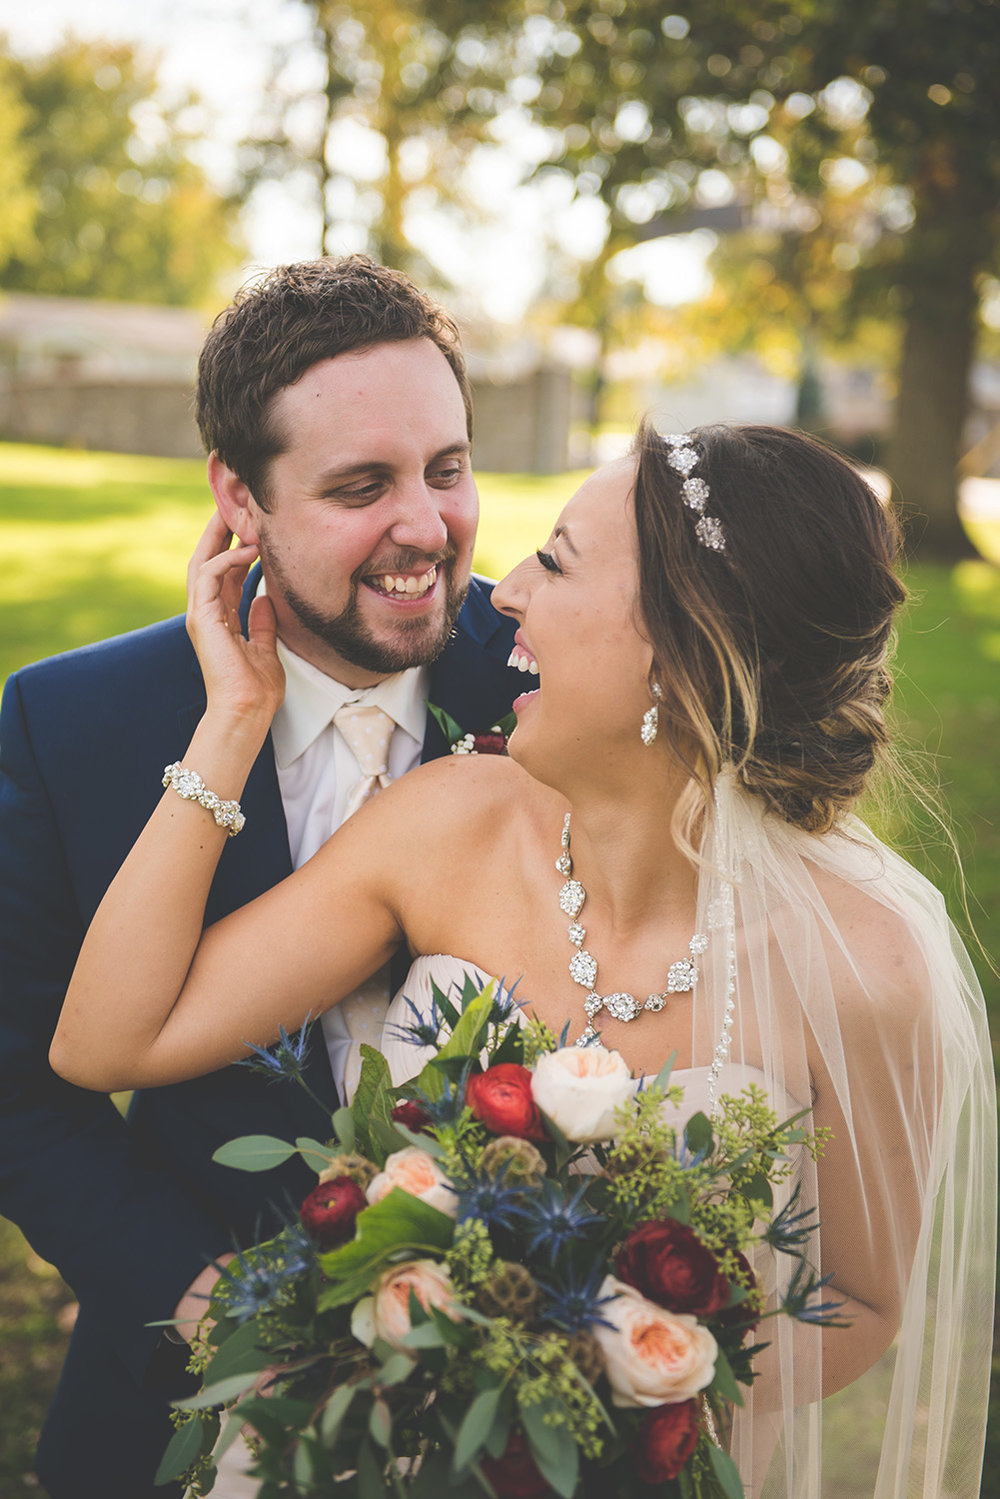 Cassandra and Derek enjoying a few laughs before their reception at the Mercer County Fairgrounds.